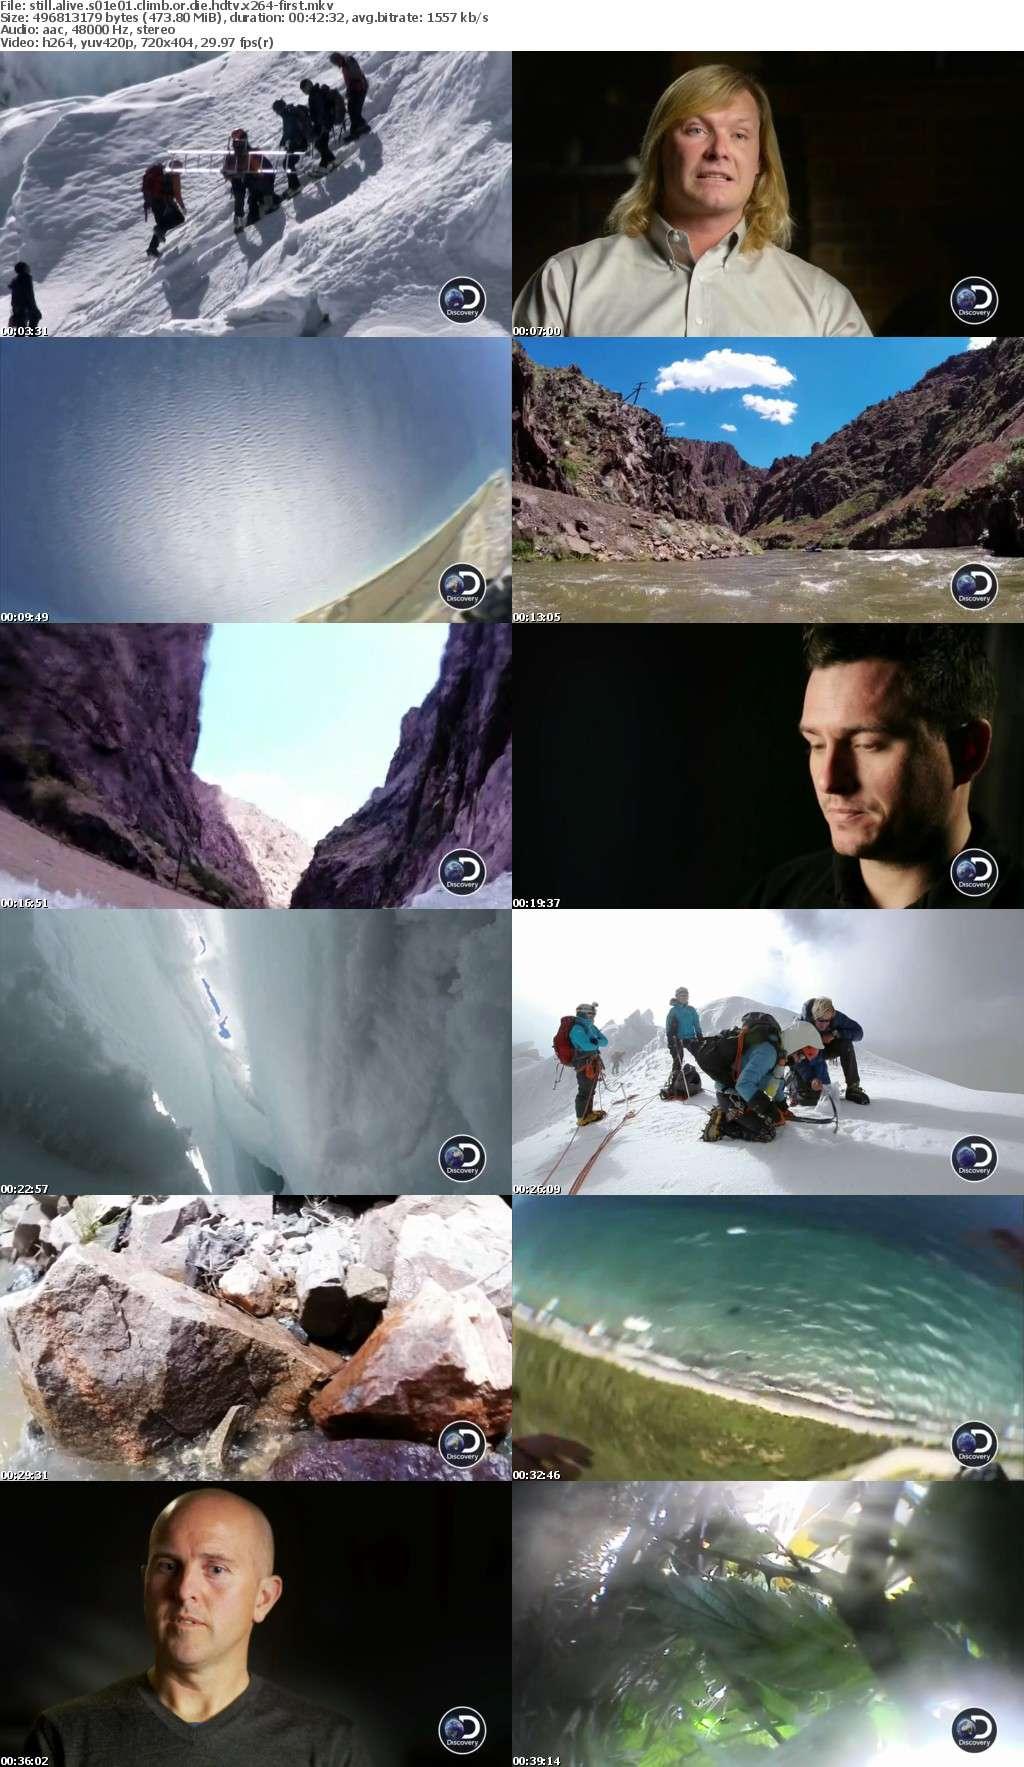 Still Alive S01E01 Climb or Die HDTV x264-FIRST